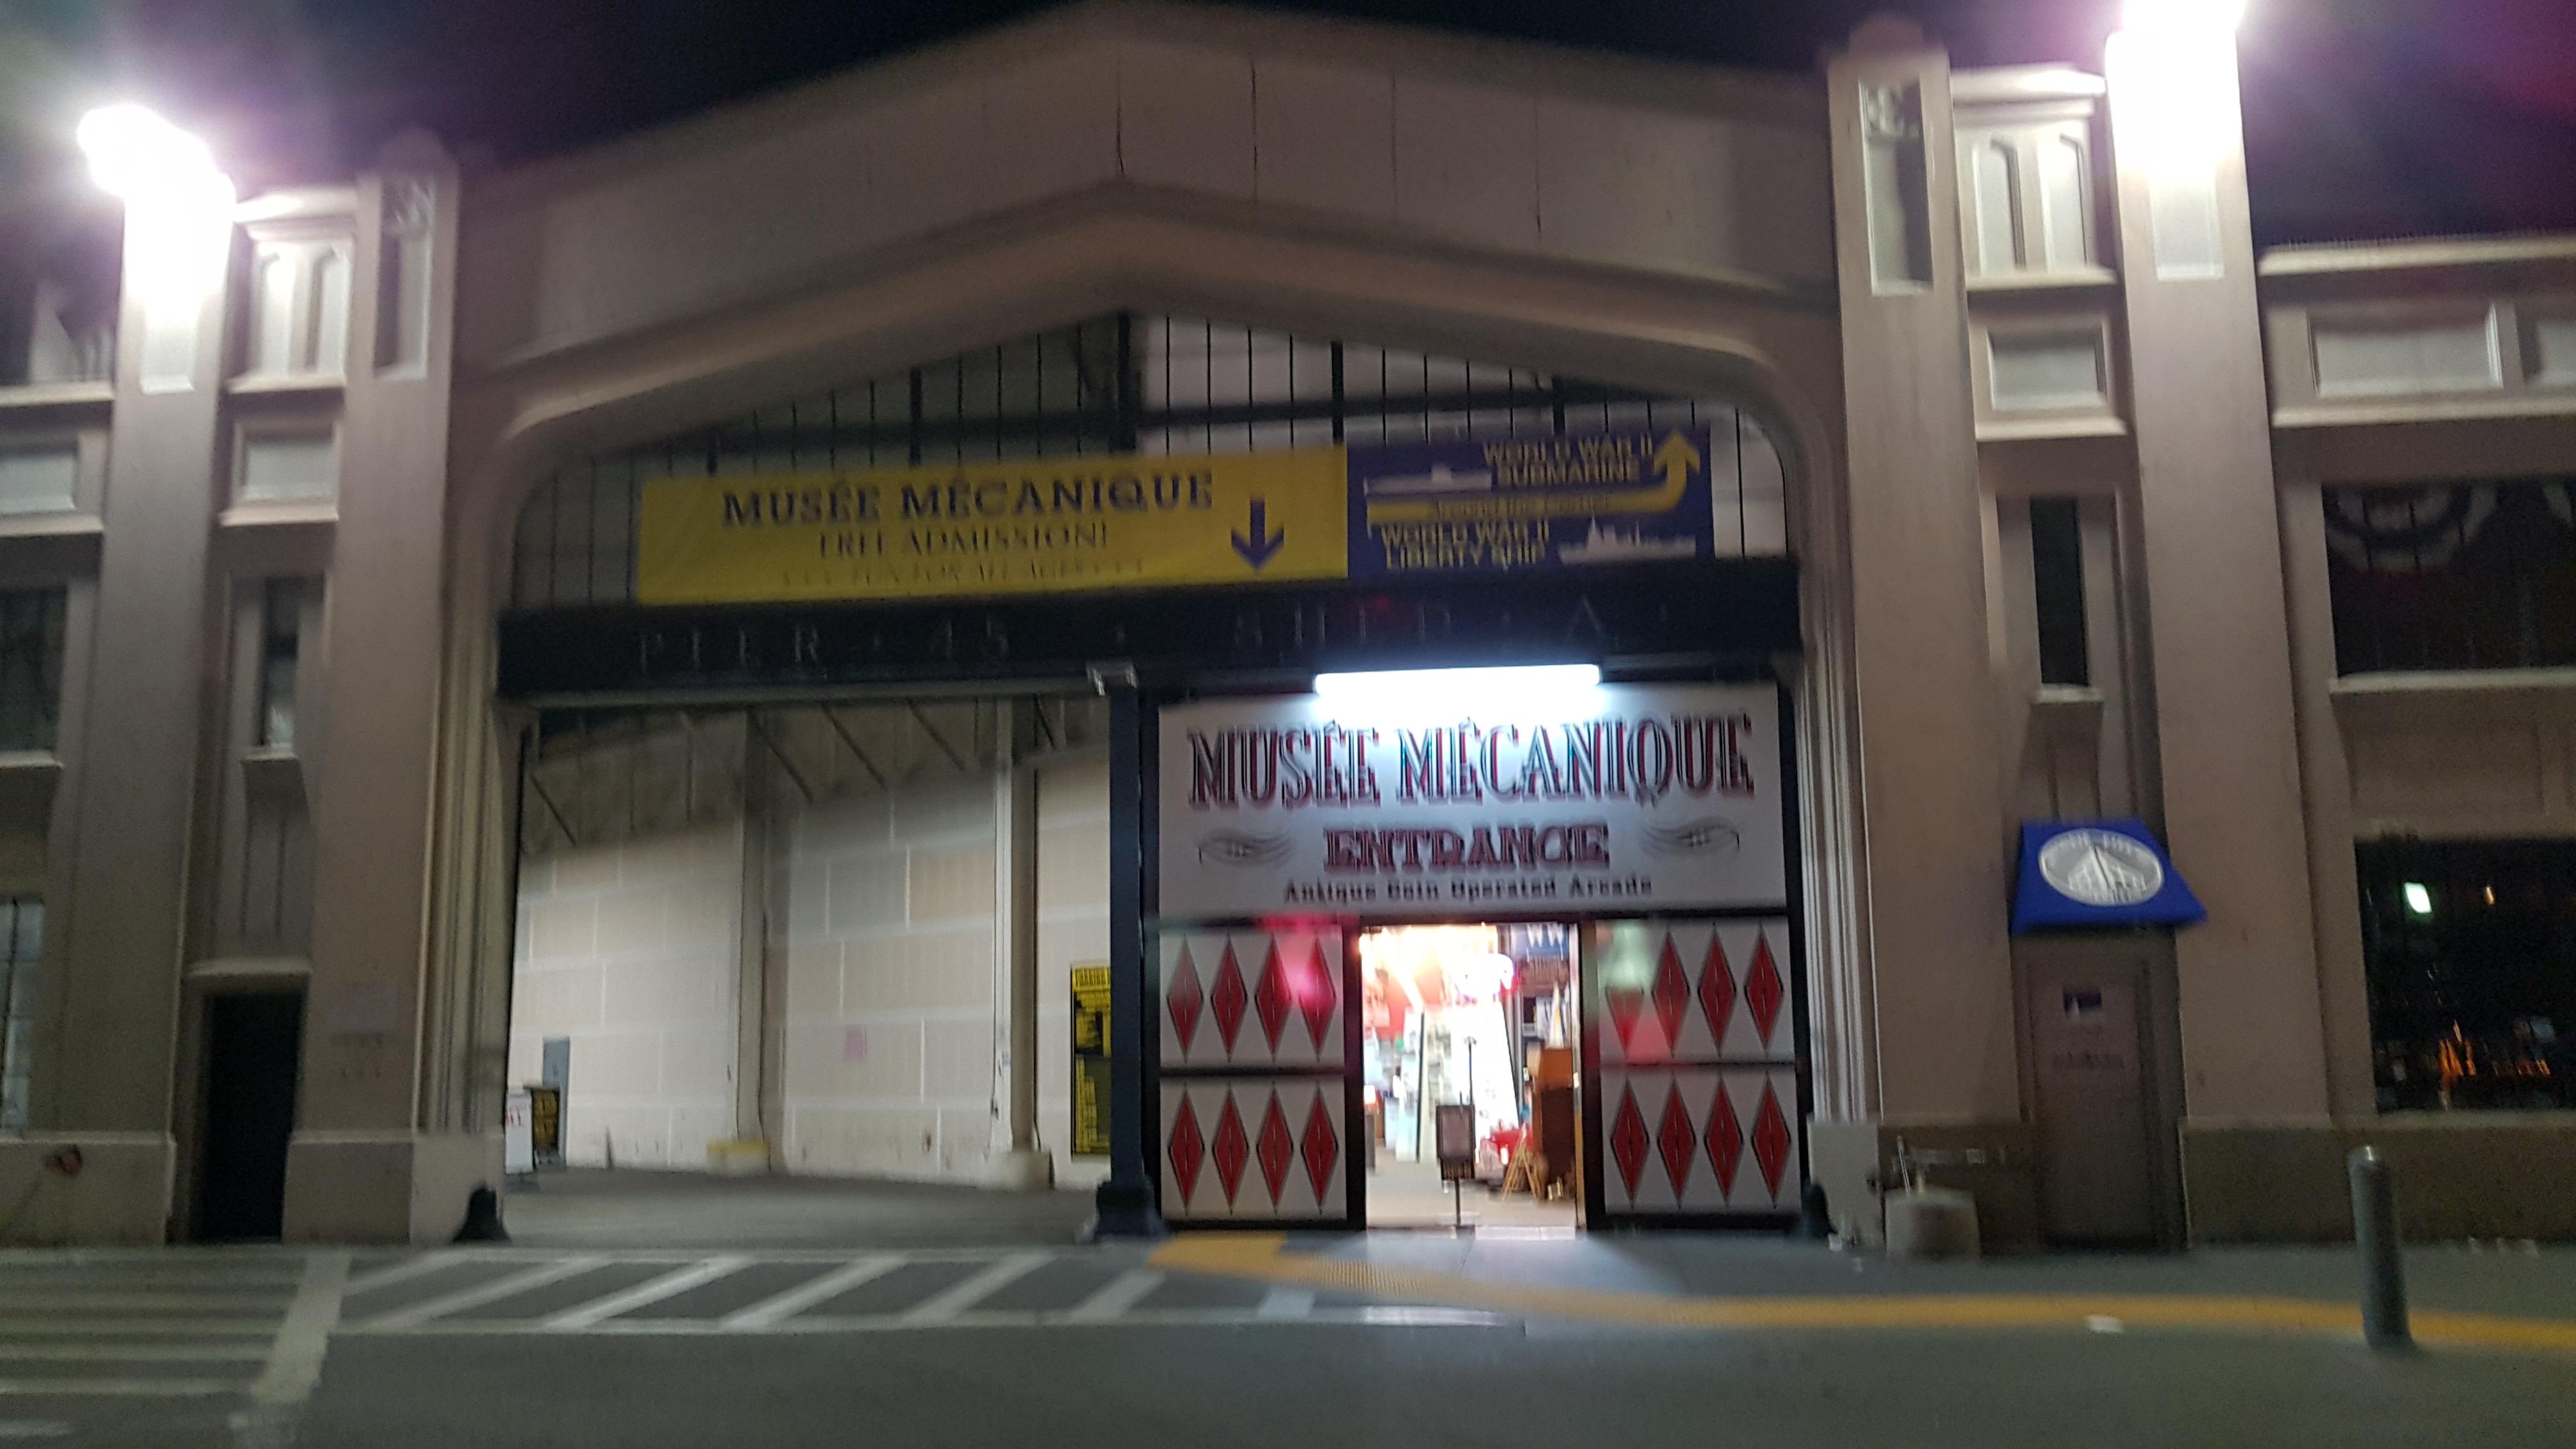 Boudin, cable car, Clam Chowder, conference call, Fisherman's wharp, incall, Musee mechanique, Pier, Pier 39, see lion, SF, wstern style, [샌프란시스코] Fisherman's Wharp 산책, 가시거리, 관광지, 길거리 연주가, 길거리 음식, 난항, 날씨, 남의 시선, 노츠북, 대중교통 타임테이블, 대합 스프, 대합 크림 스프, 덜컹거림, 레스토랑, 모닥불, 무색, 바다 사자, 바다사자, 보우딘, 비몽사몽, 빠네, 산책, 산책 코스, 상점, 상징적 조형물, 샌프란, 샌프란시스코, 소스코드, 시간표, 시차적은, 식사, 신 맛, 심장, 야경, 야생, 어부들의 부둣가, 오락실, 외출, 위화감, 유니언 스퀘어, 음식점, 자유분방함, 자유이용권, 조개 스프, 조개 크림 스프, 진동, 첫 번째 밤, 캐이블 카 가격, 코스, 코인 기계 오락기, 코인 오락기, 크리스마스, 크리스마스 트리, 크림 스프, 클램 차우더, 타인의 시선, 트리, 편도, 피셔맨스 워프, 하트, 해산물 요리